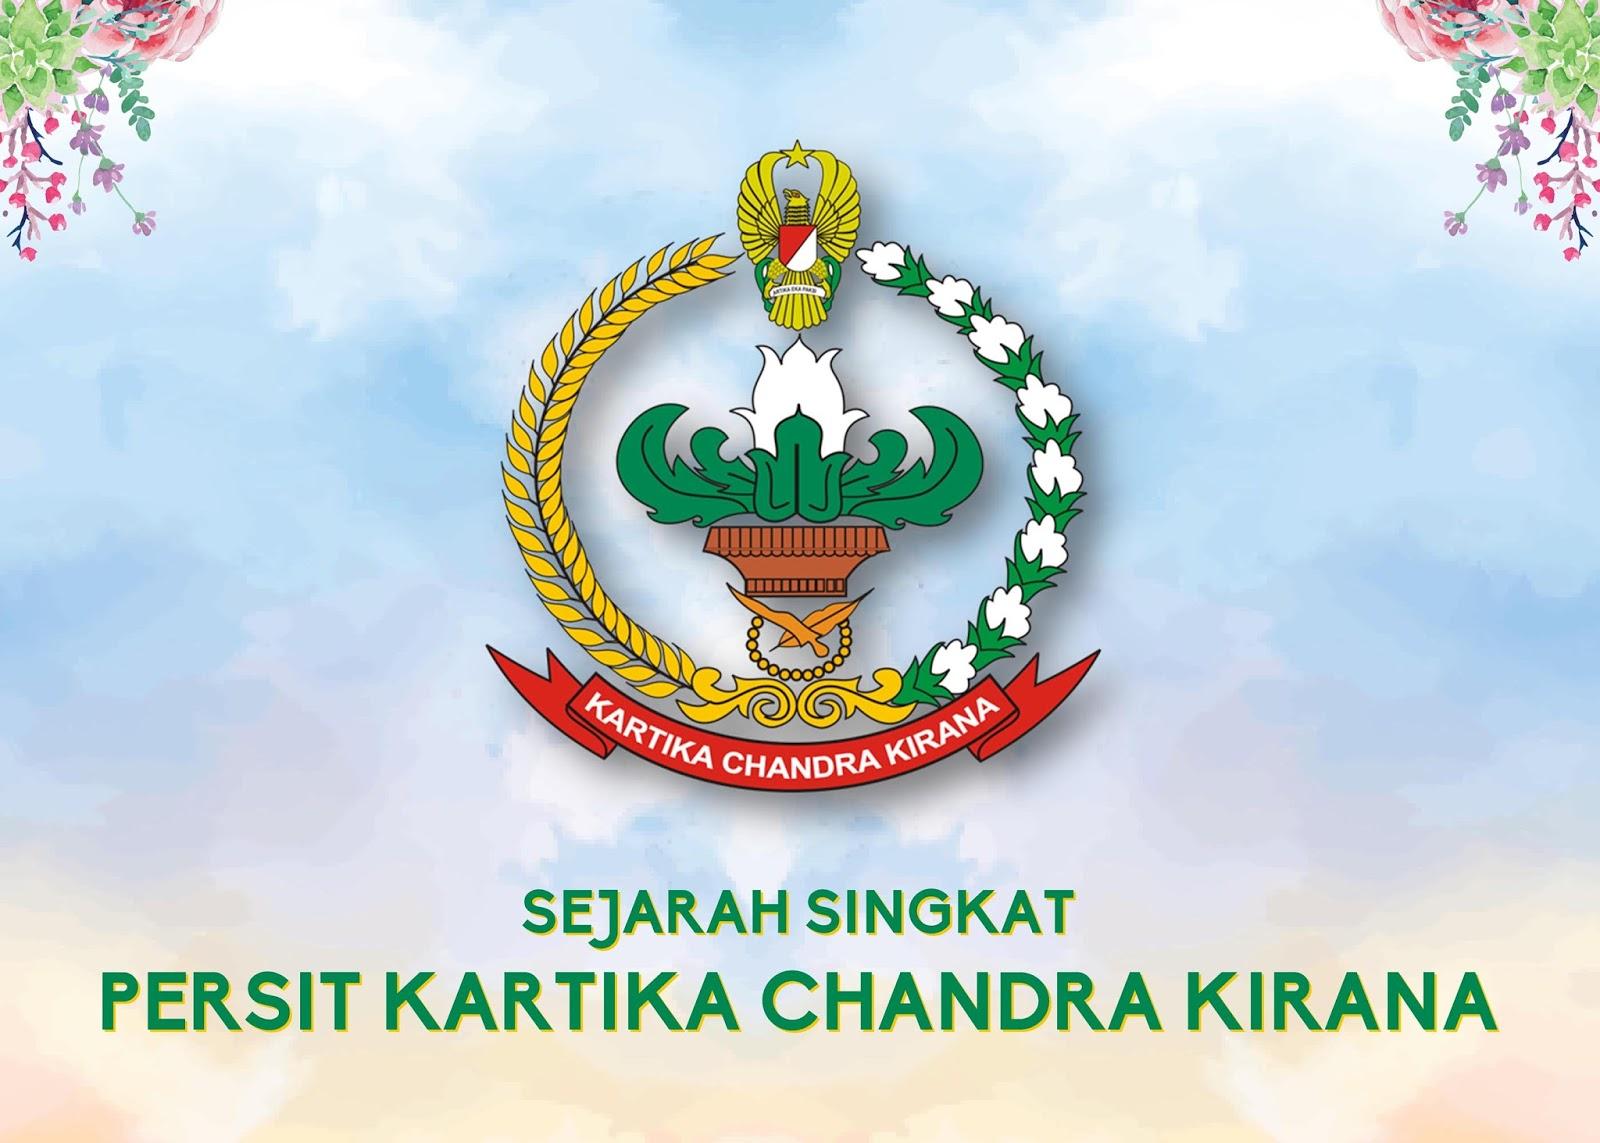 Sejarah Singkat Persit Kartika Chandra Kirana Roosvansia